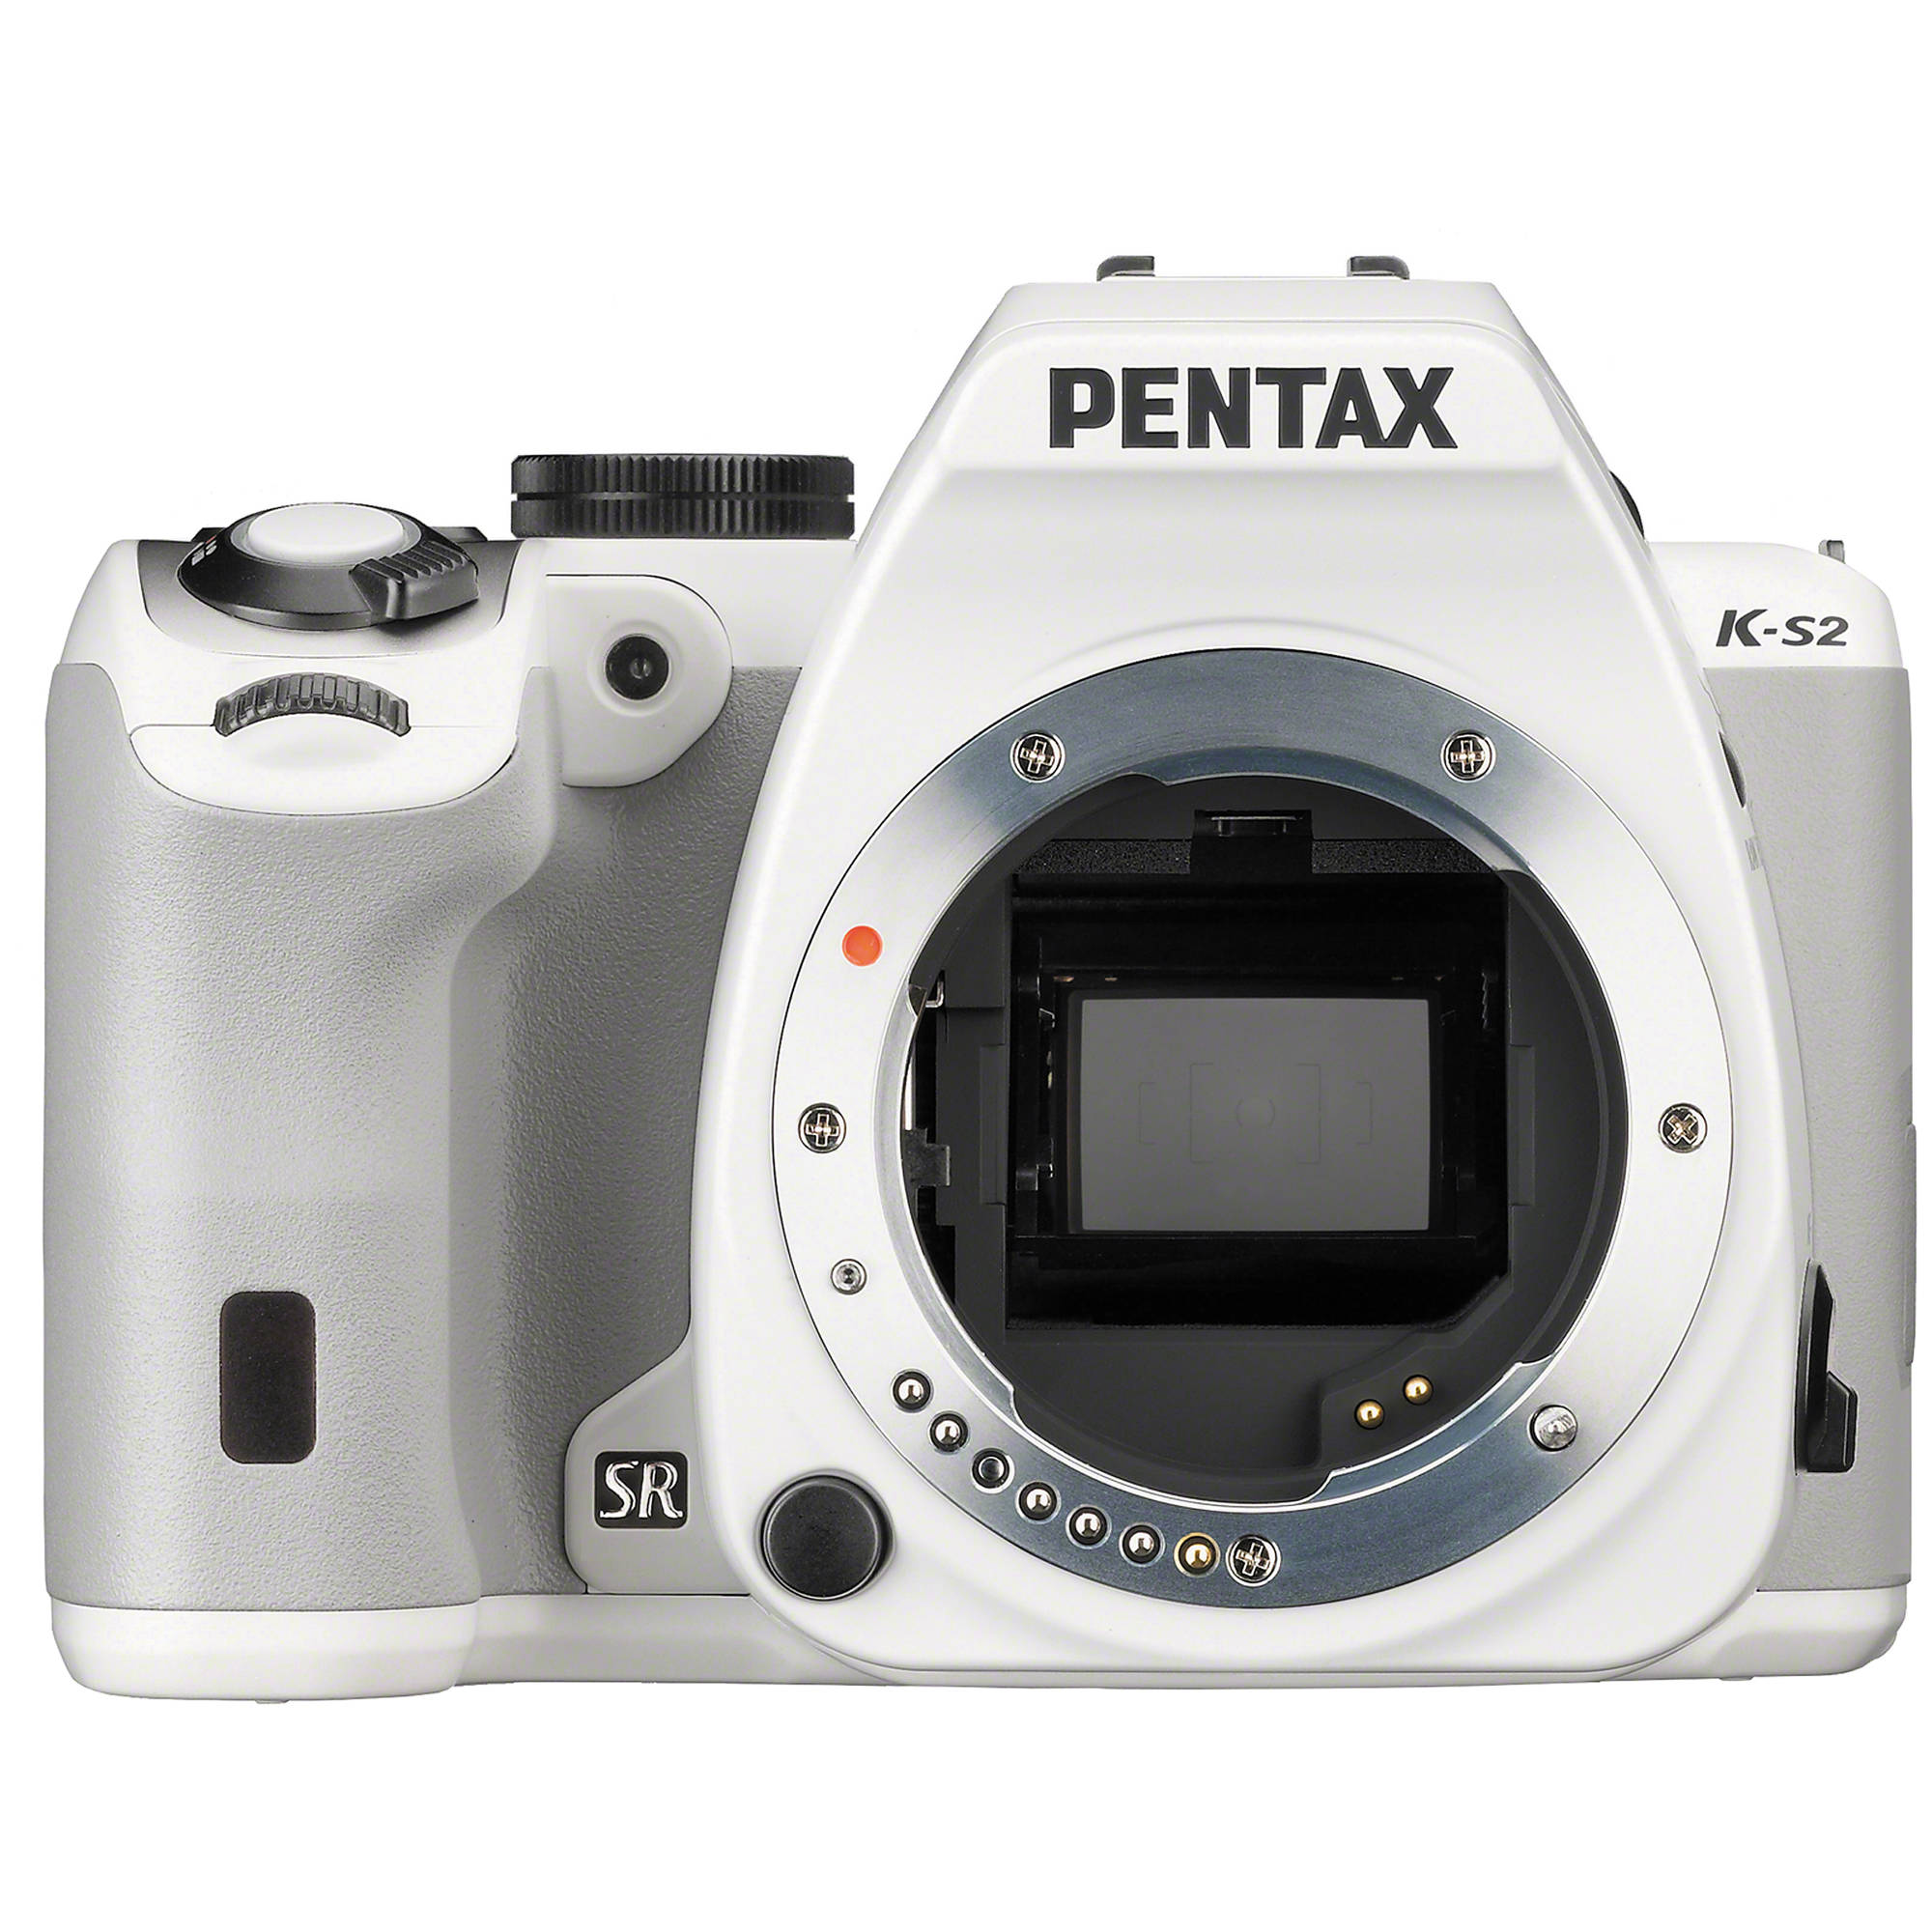 pentax k-s2 dslr camera (body only, white) 11890 b&h photo video